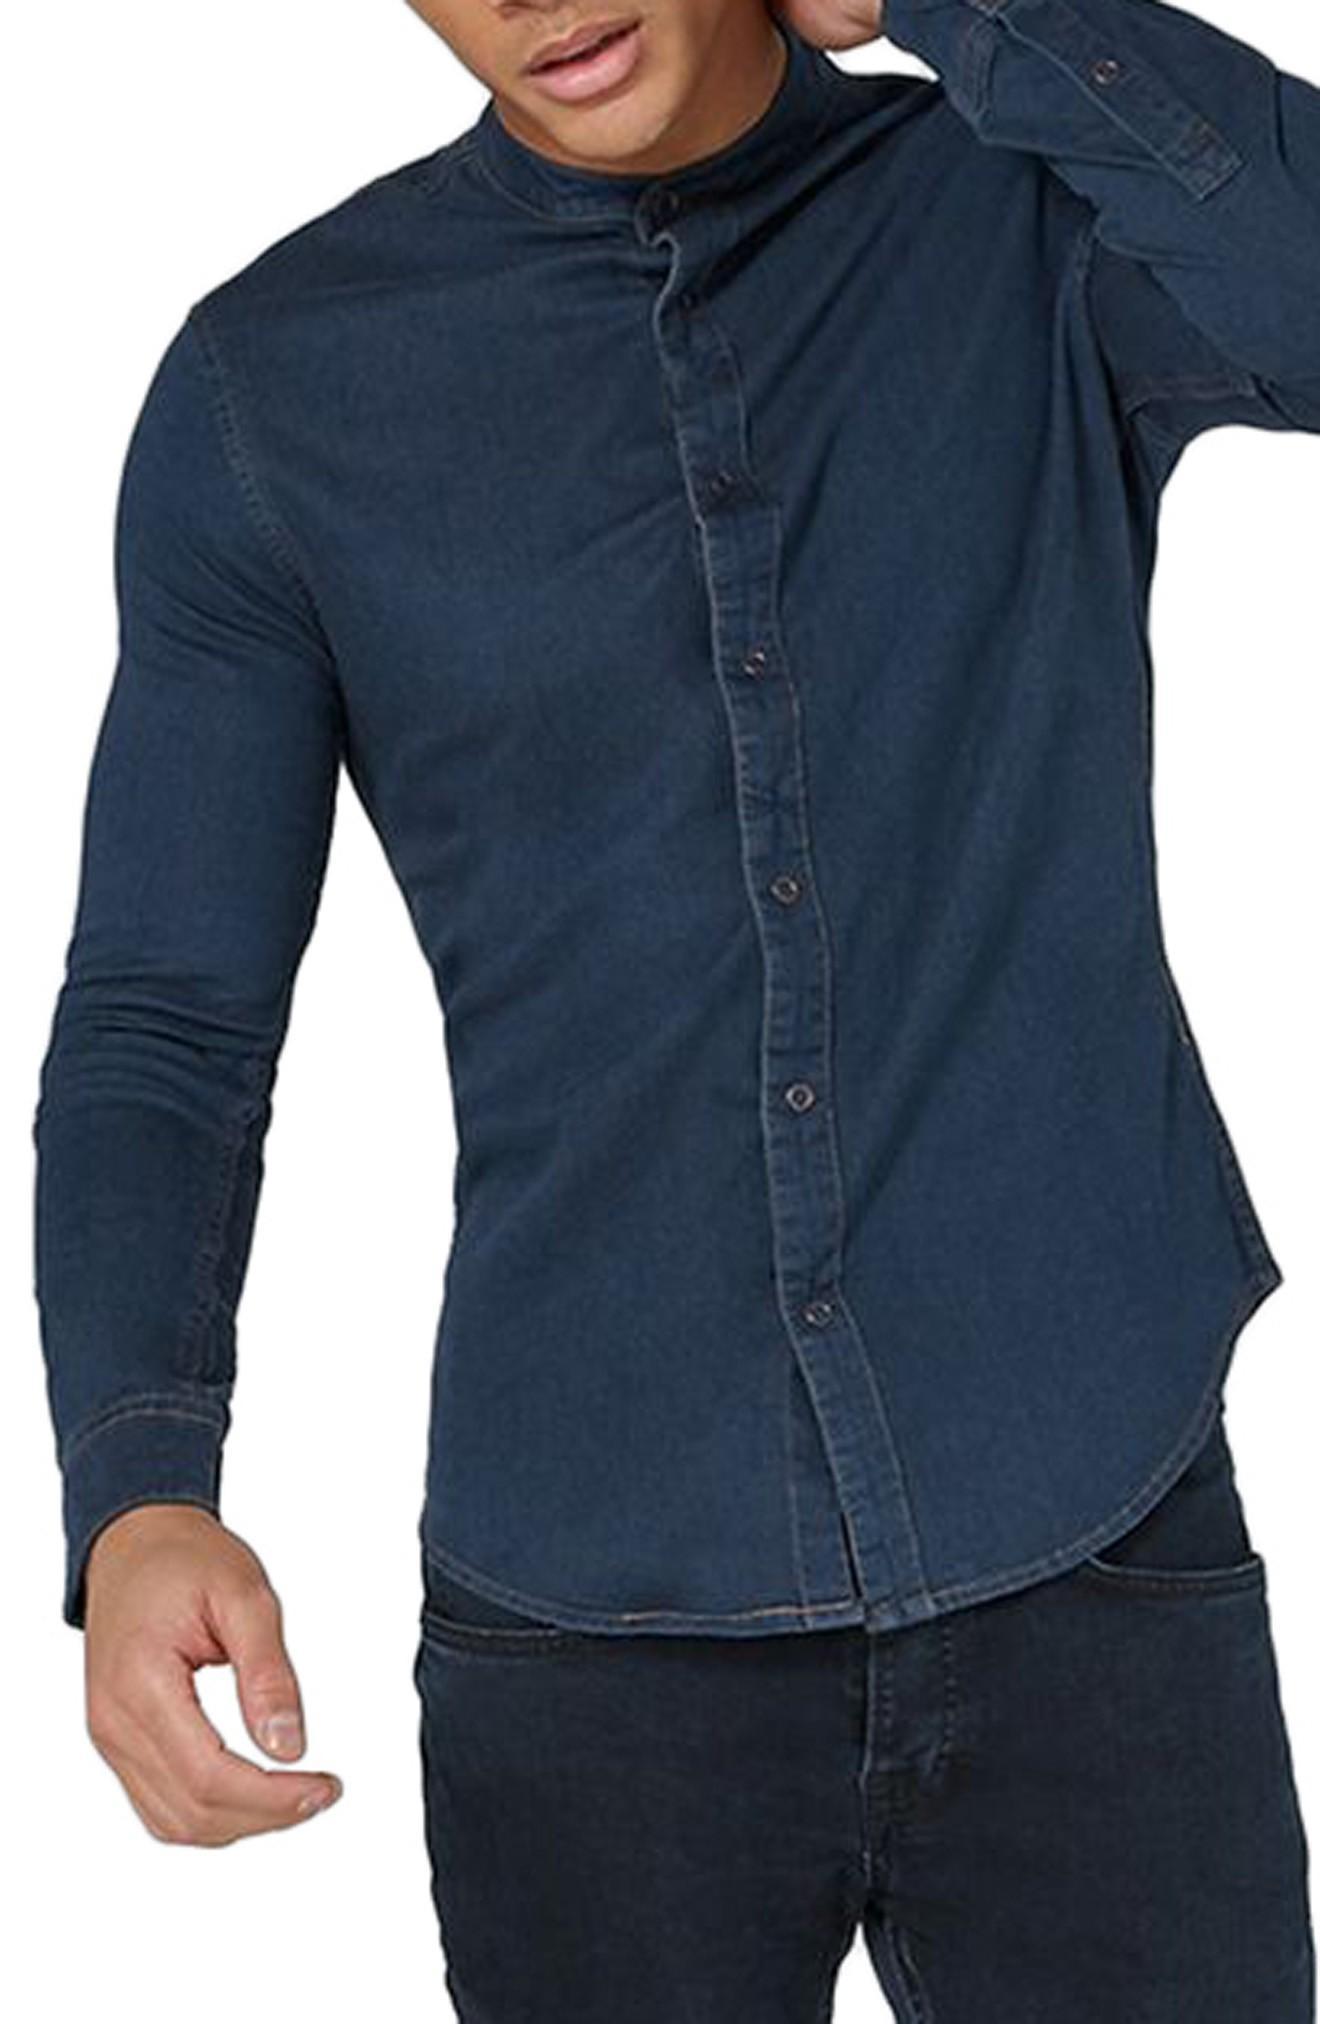 Topman Band Collar Denim Shirt In Blue